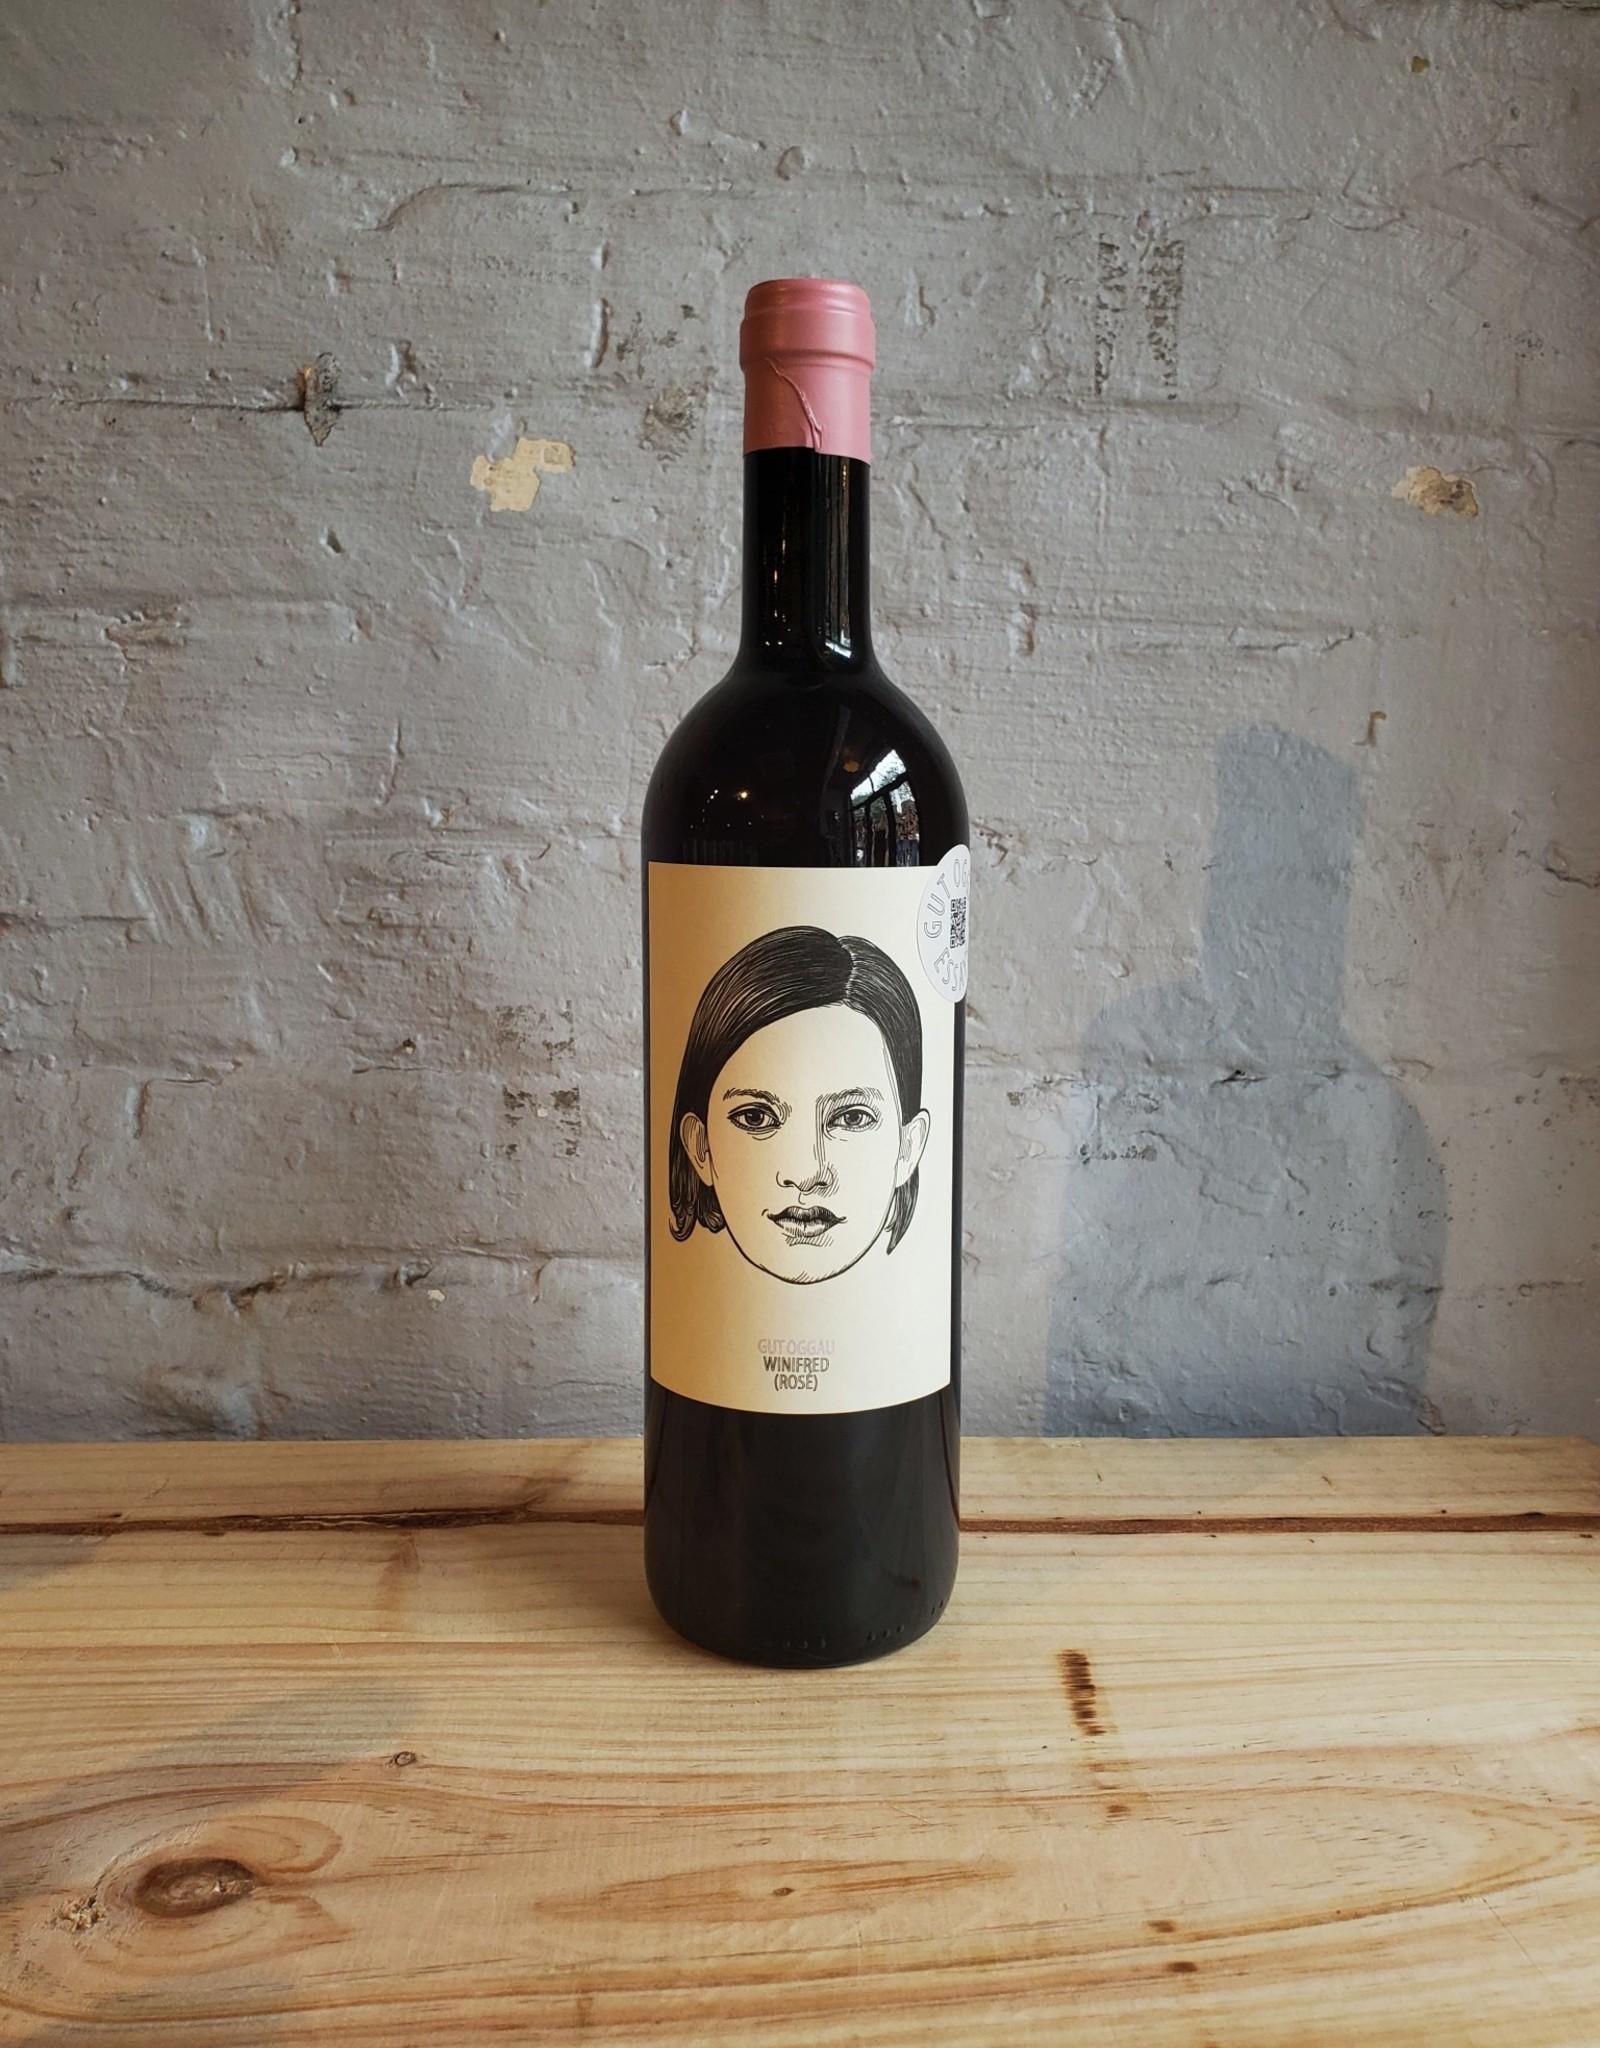 Wine 2020 Gut Oggau Winifred Rose - Burgenland, Austria (750ml)